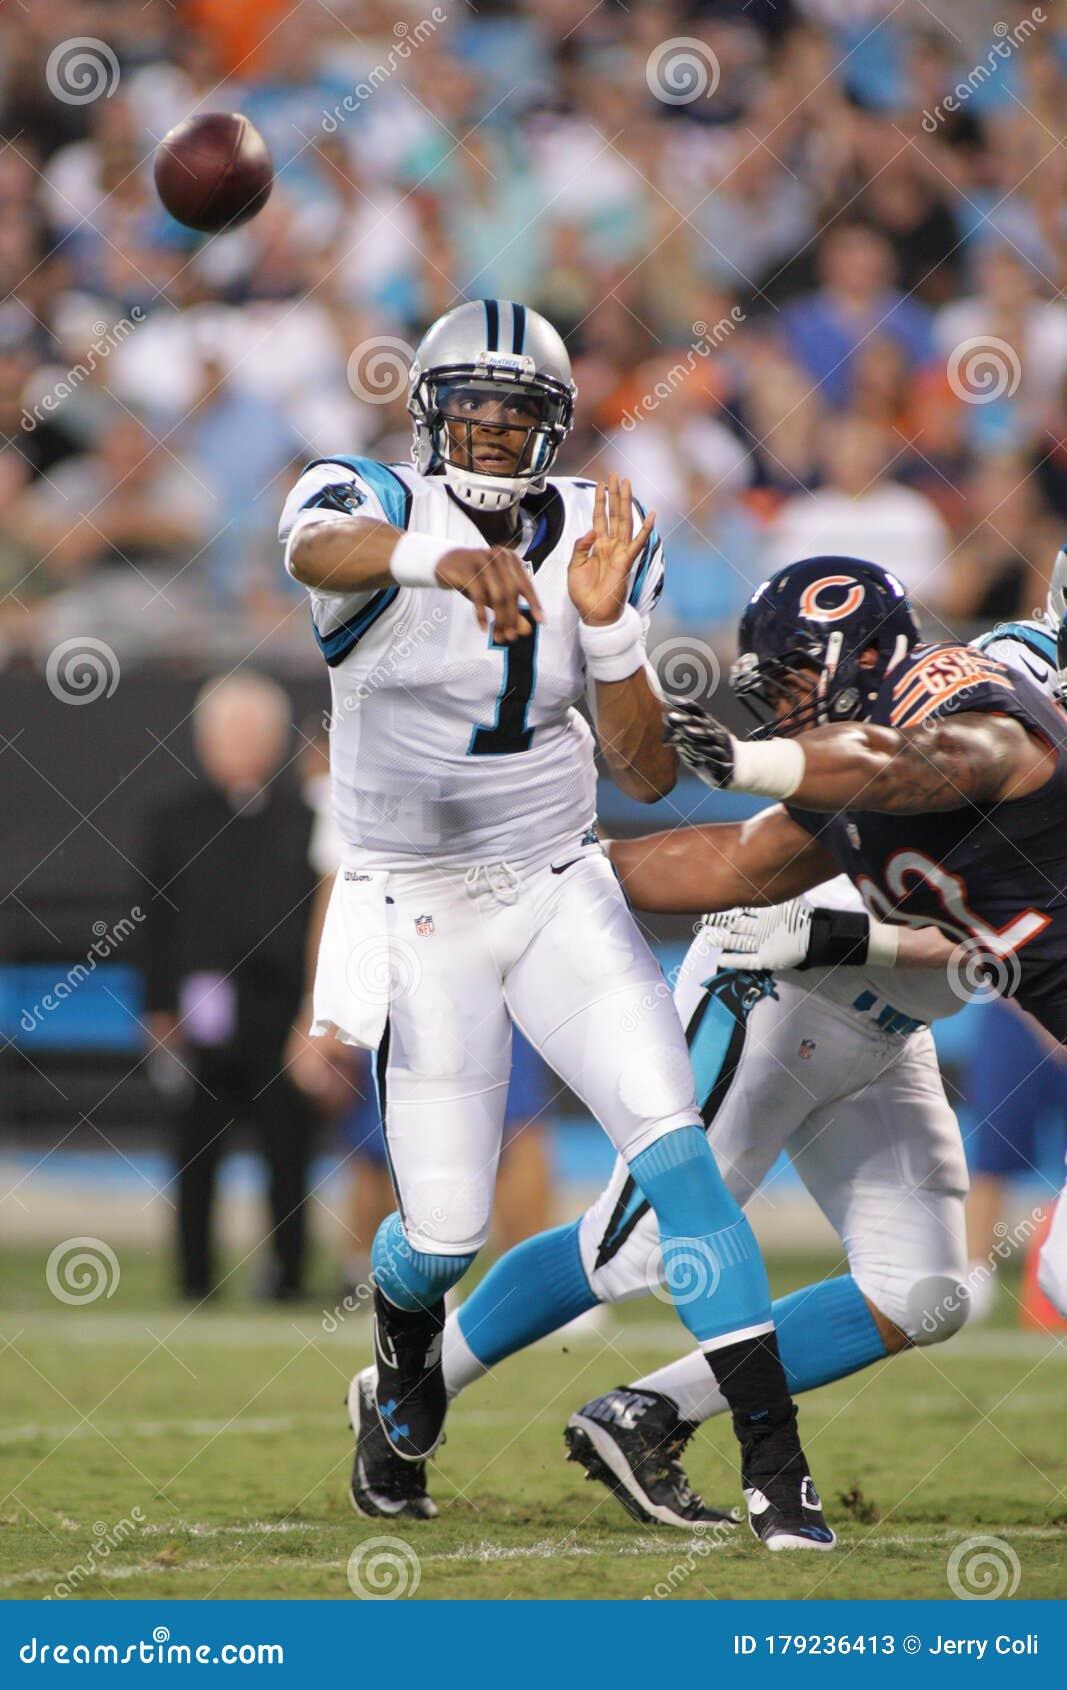 Cam Newton editorial stock photo. Image of football